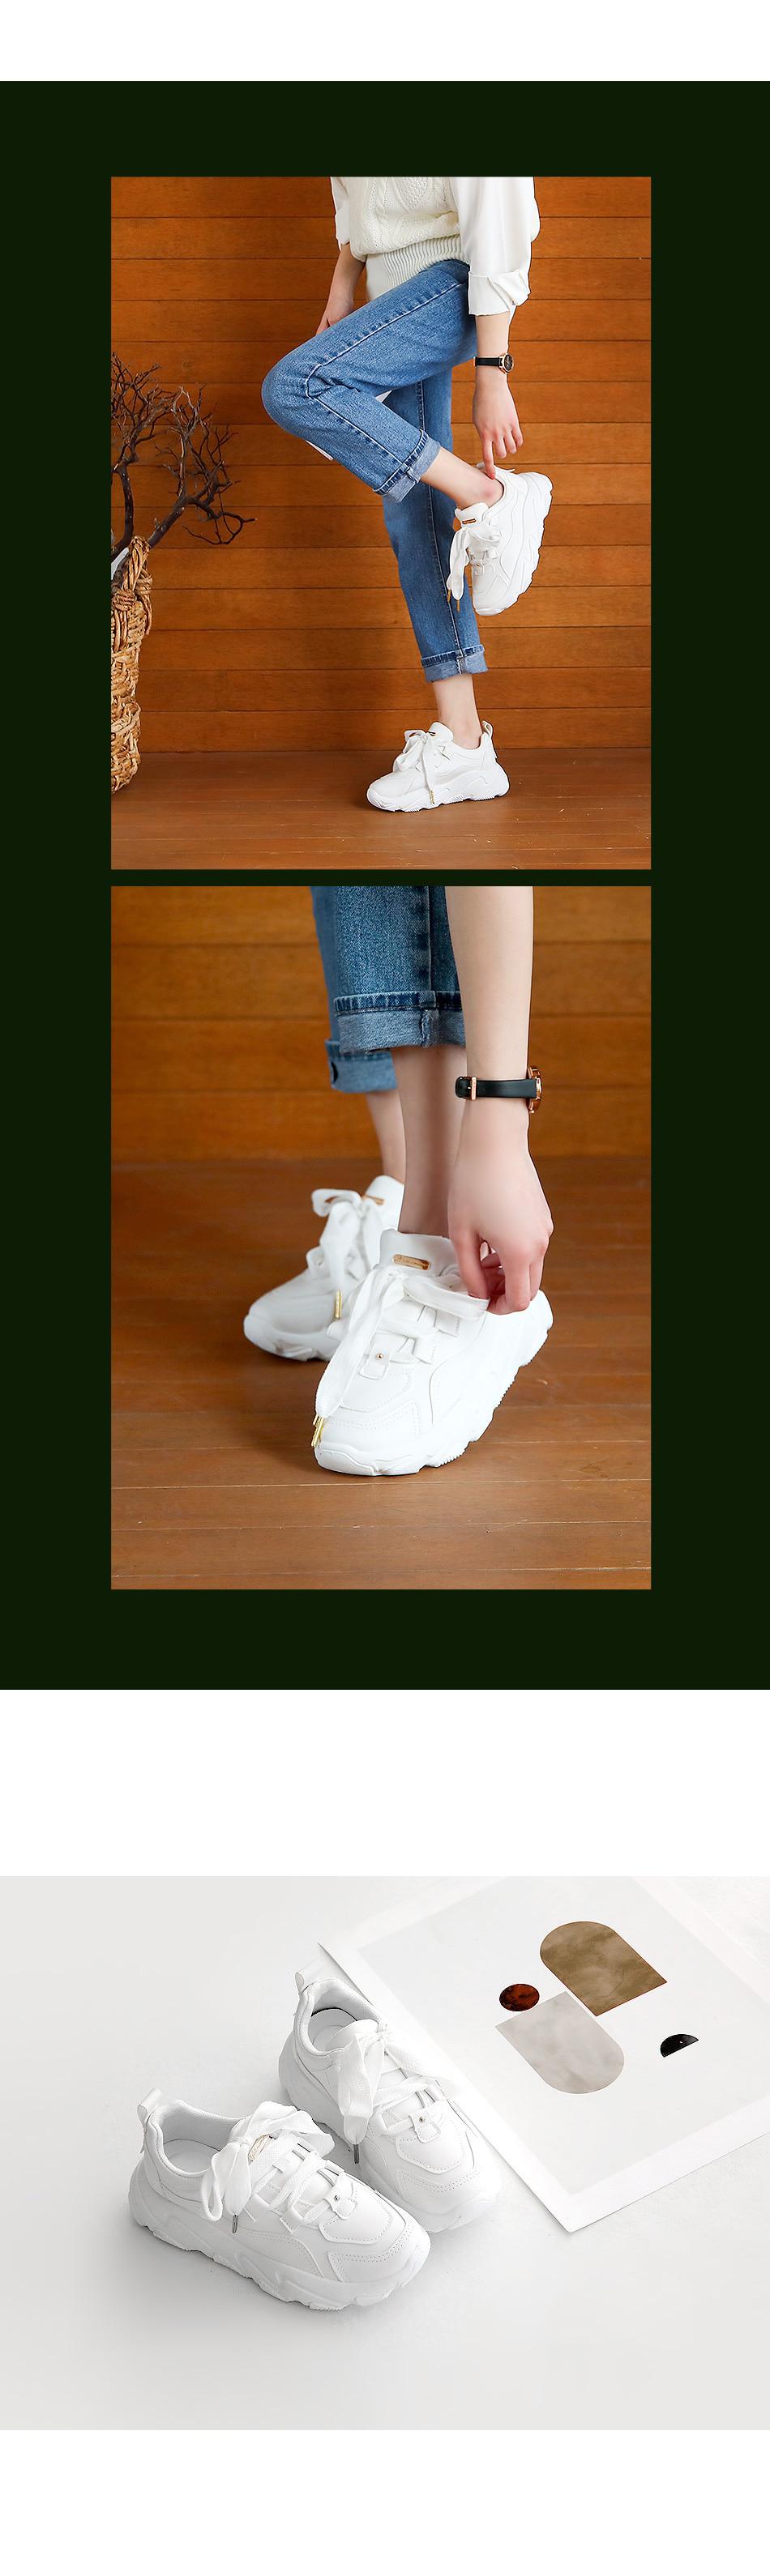 Enatt sneakers 5cm